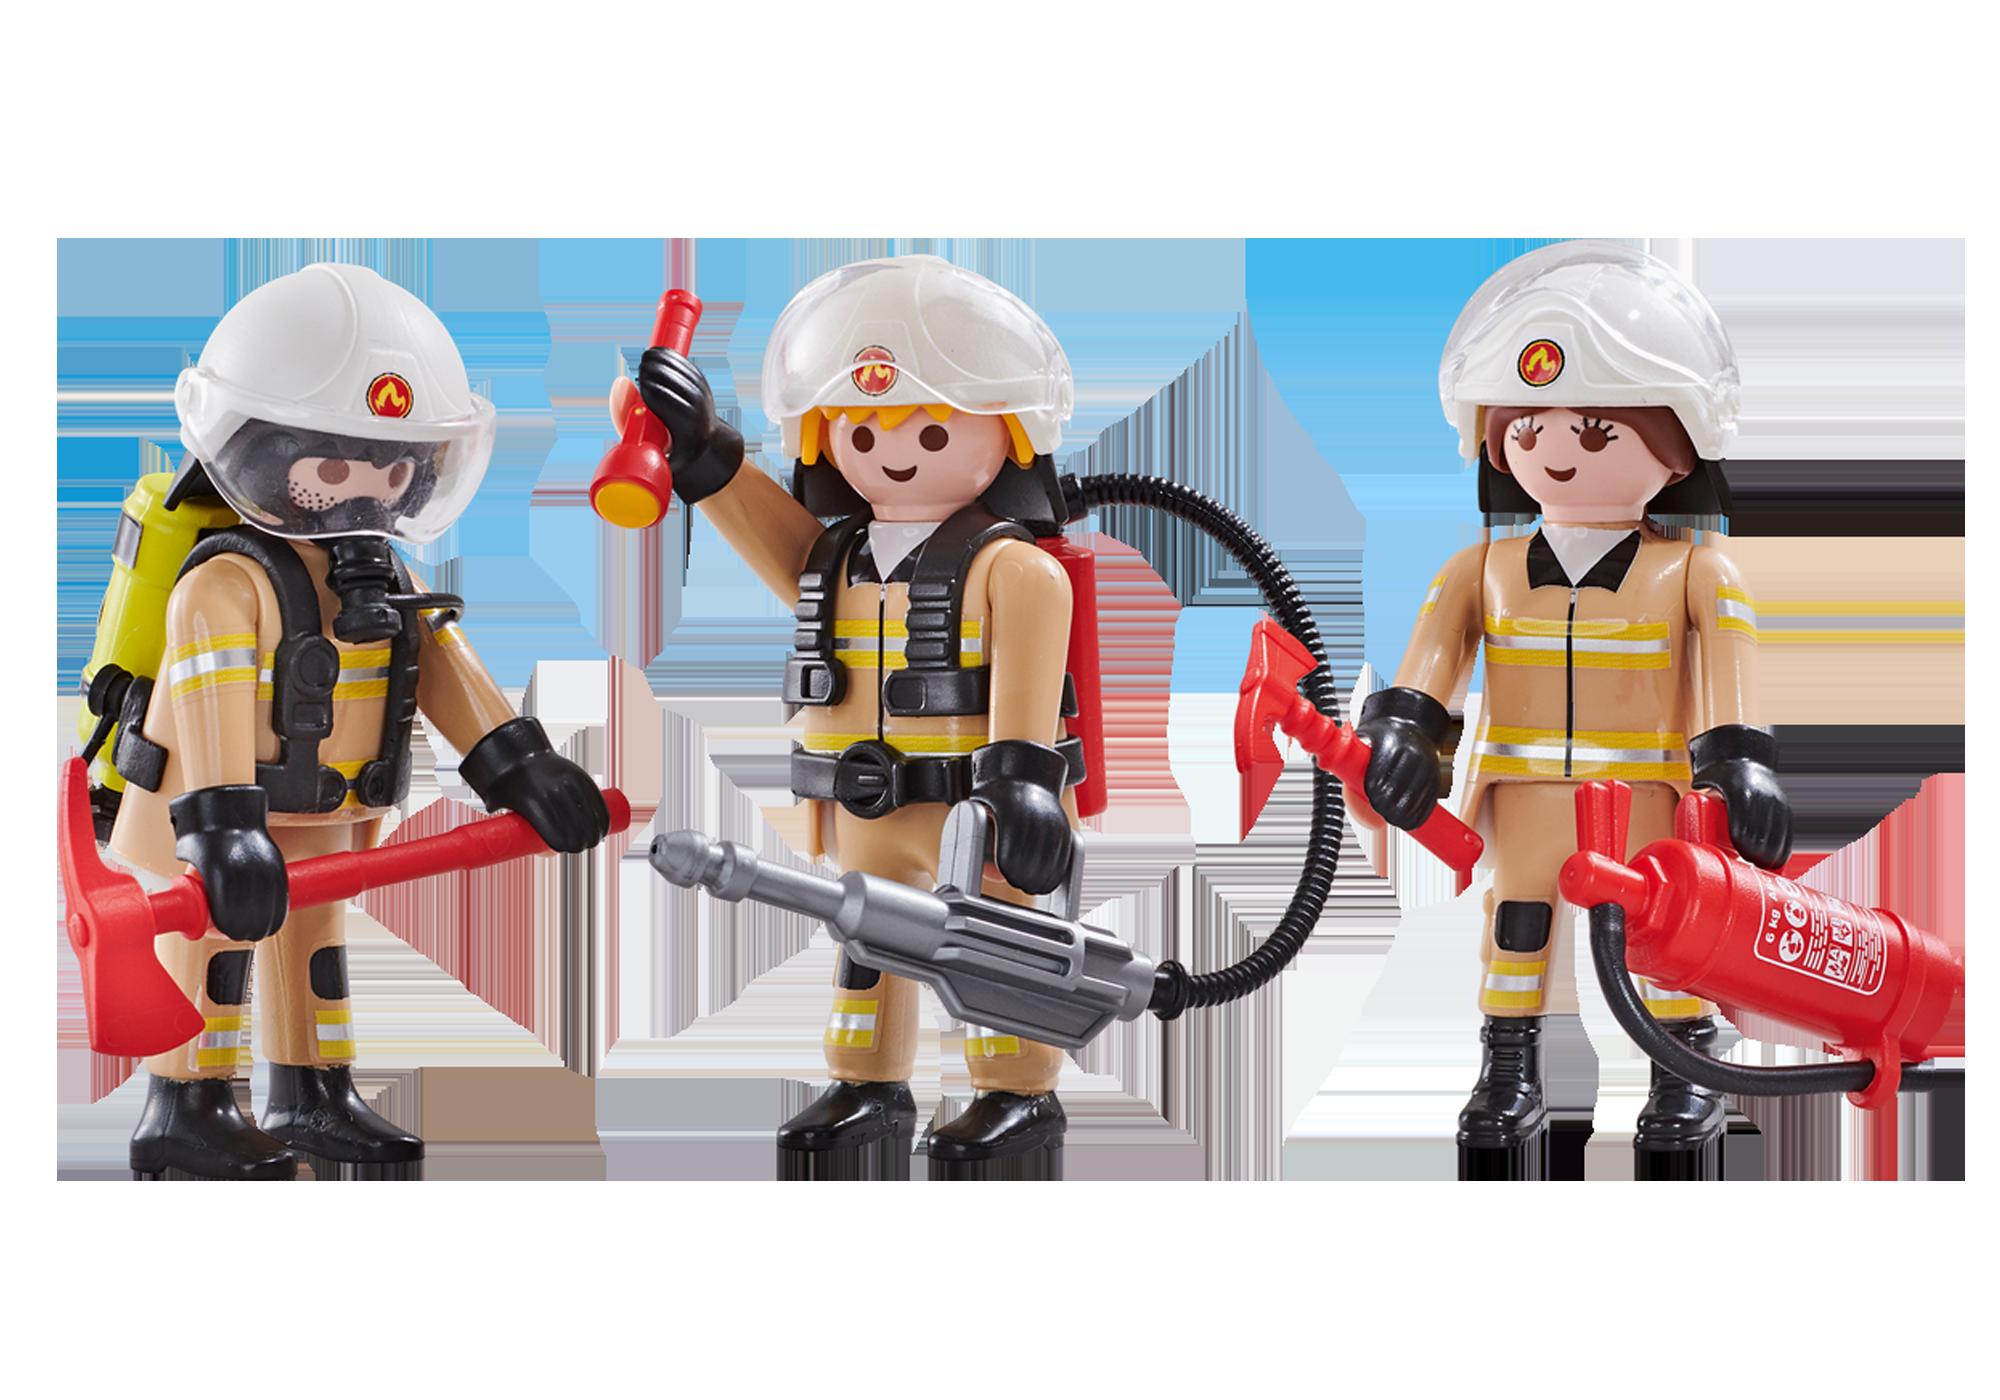 http://media.playmobil.com/i/playmobil/6584_product_detail/Feuerwehrtrupp A